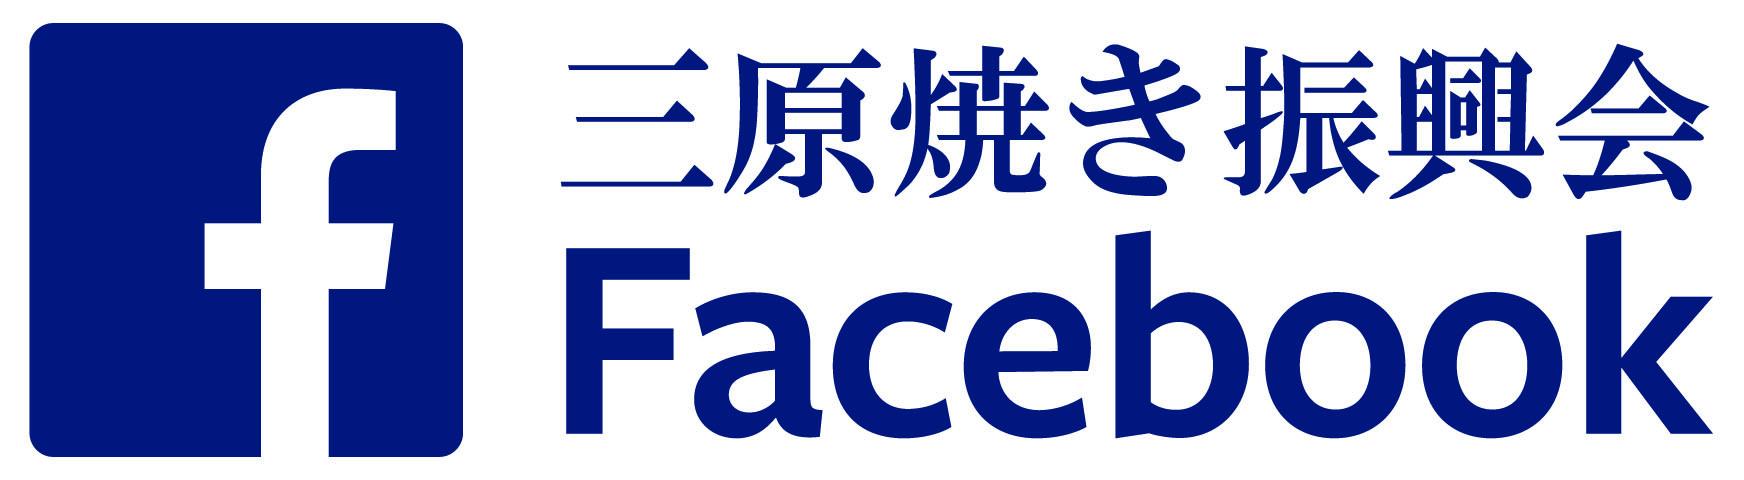 三原焼き振興会Facebook